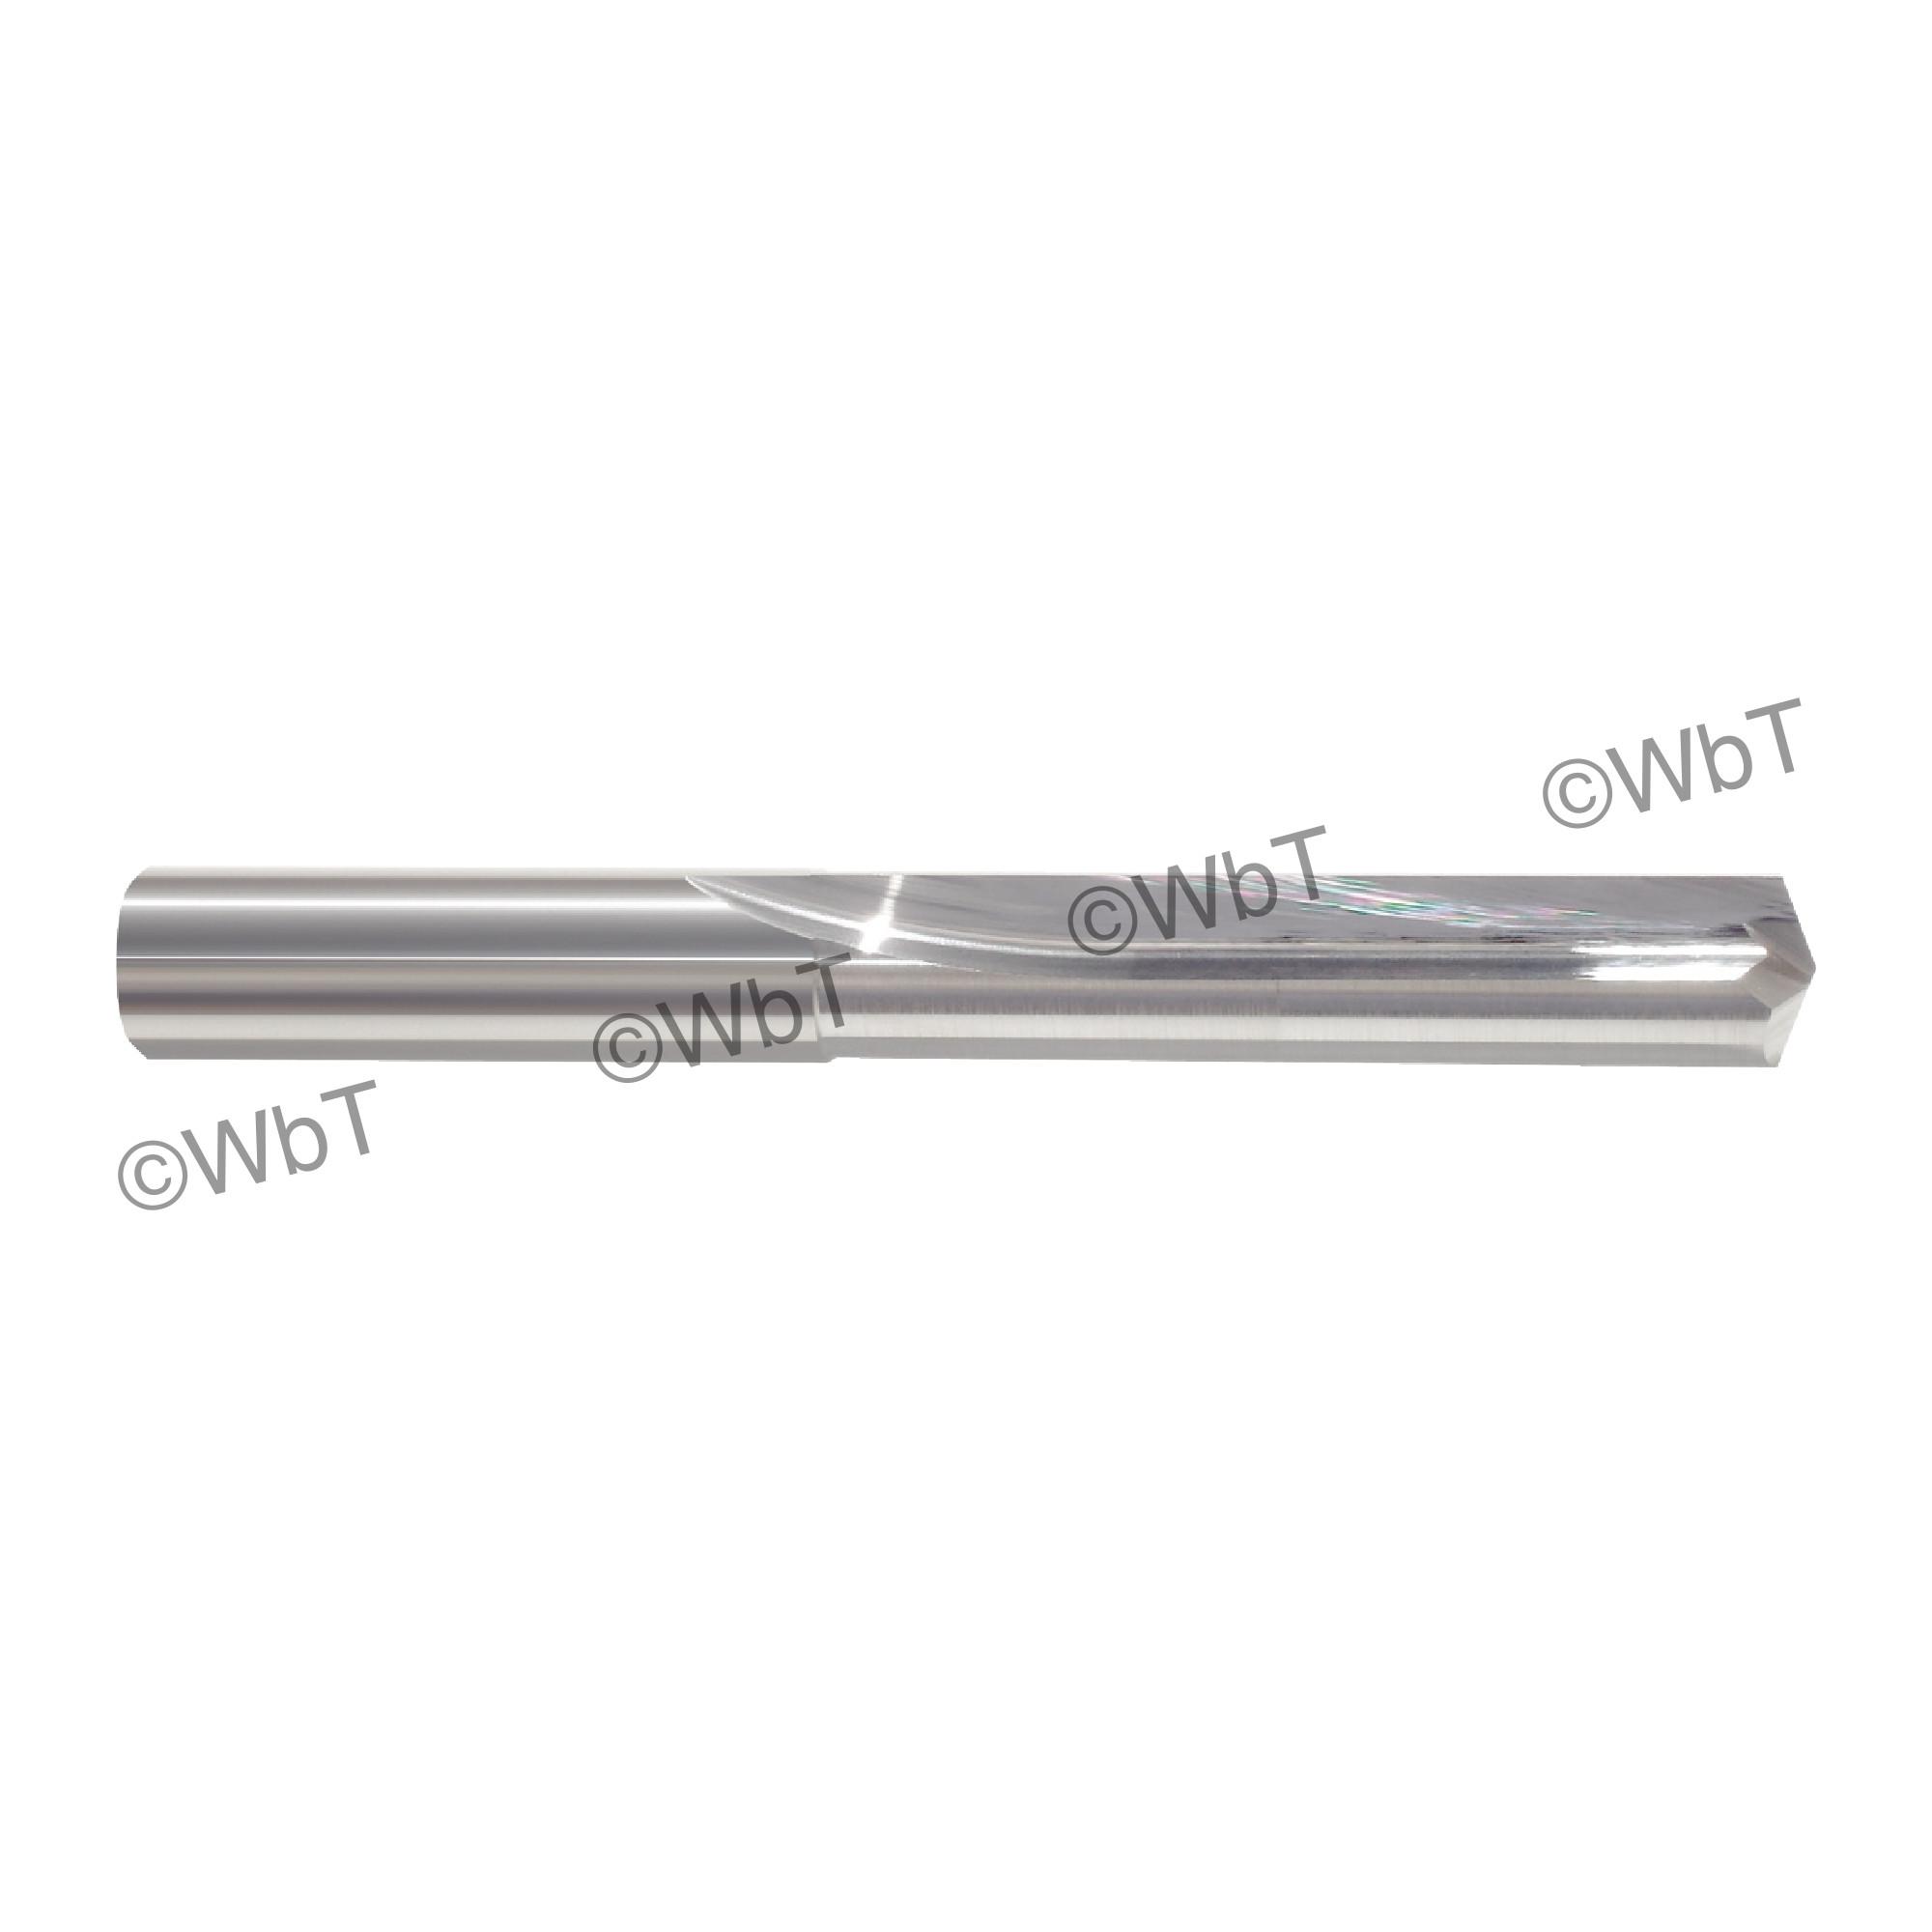 1.0MM Carbide Straight Flute Drill